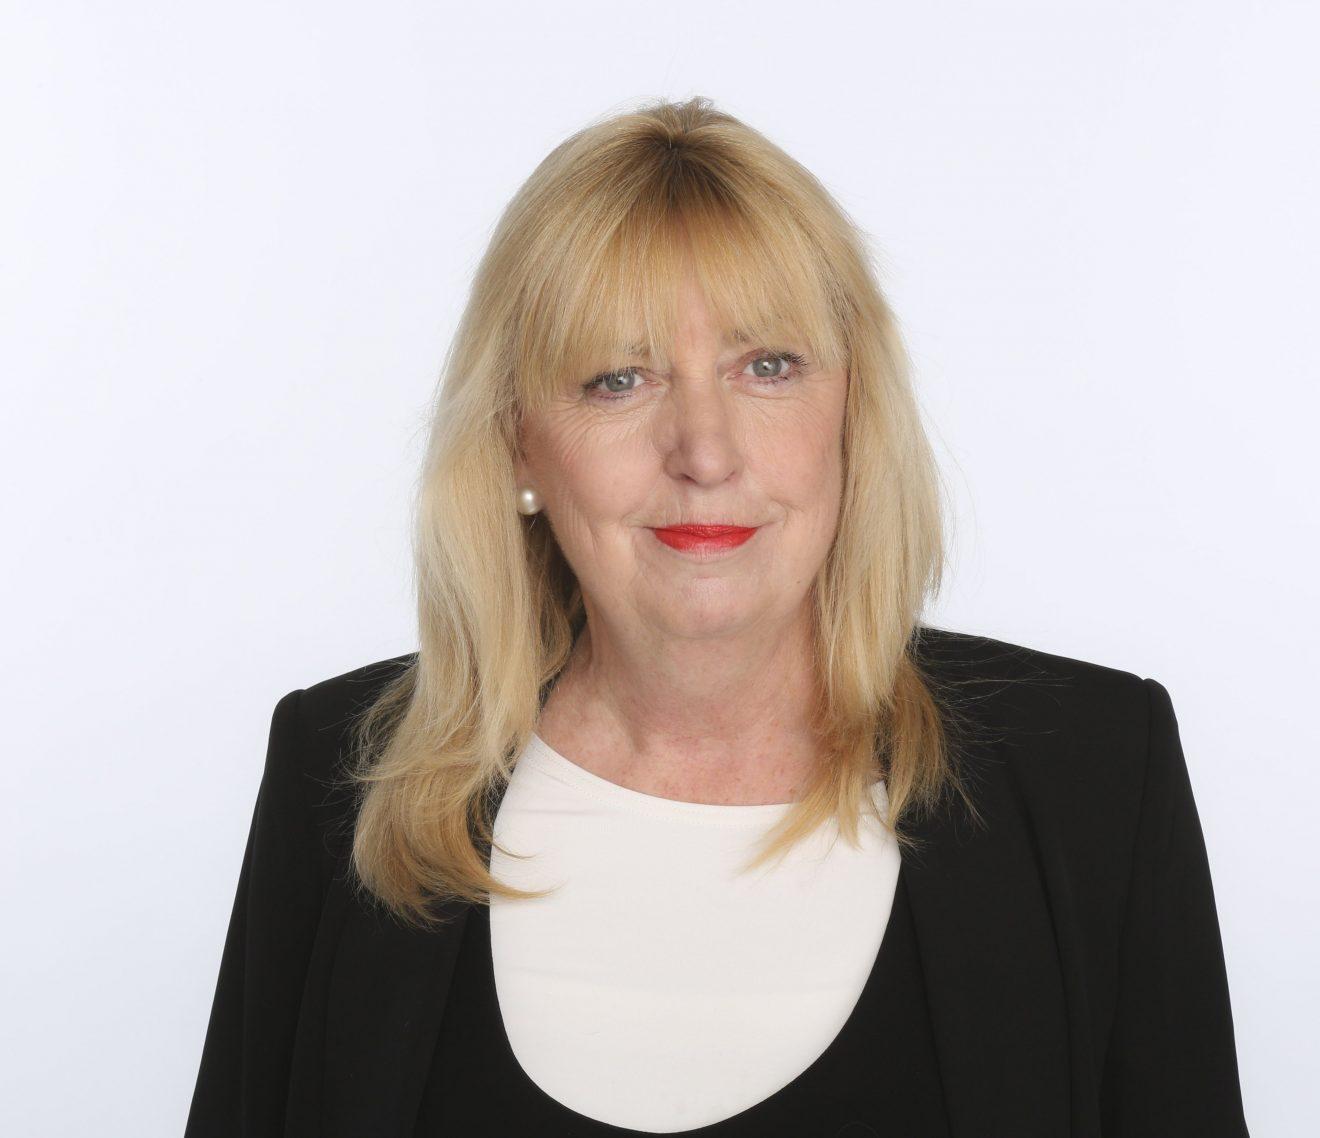 Toronto Star welcomes Susan Delacourt as new Ottawa bureau chief